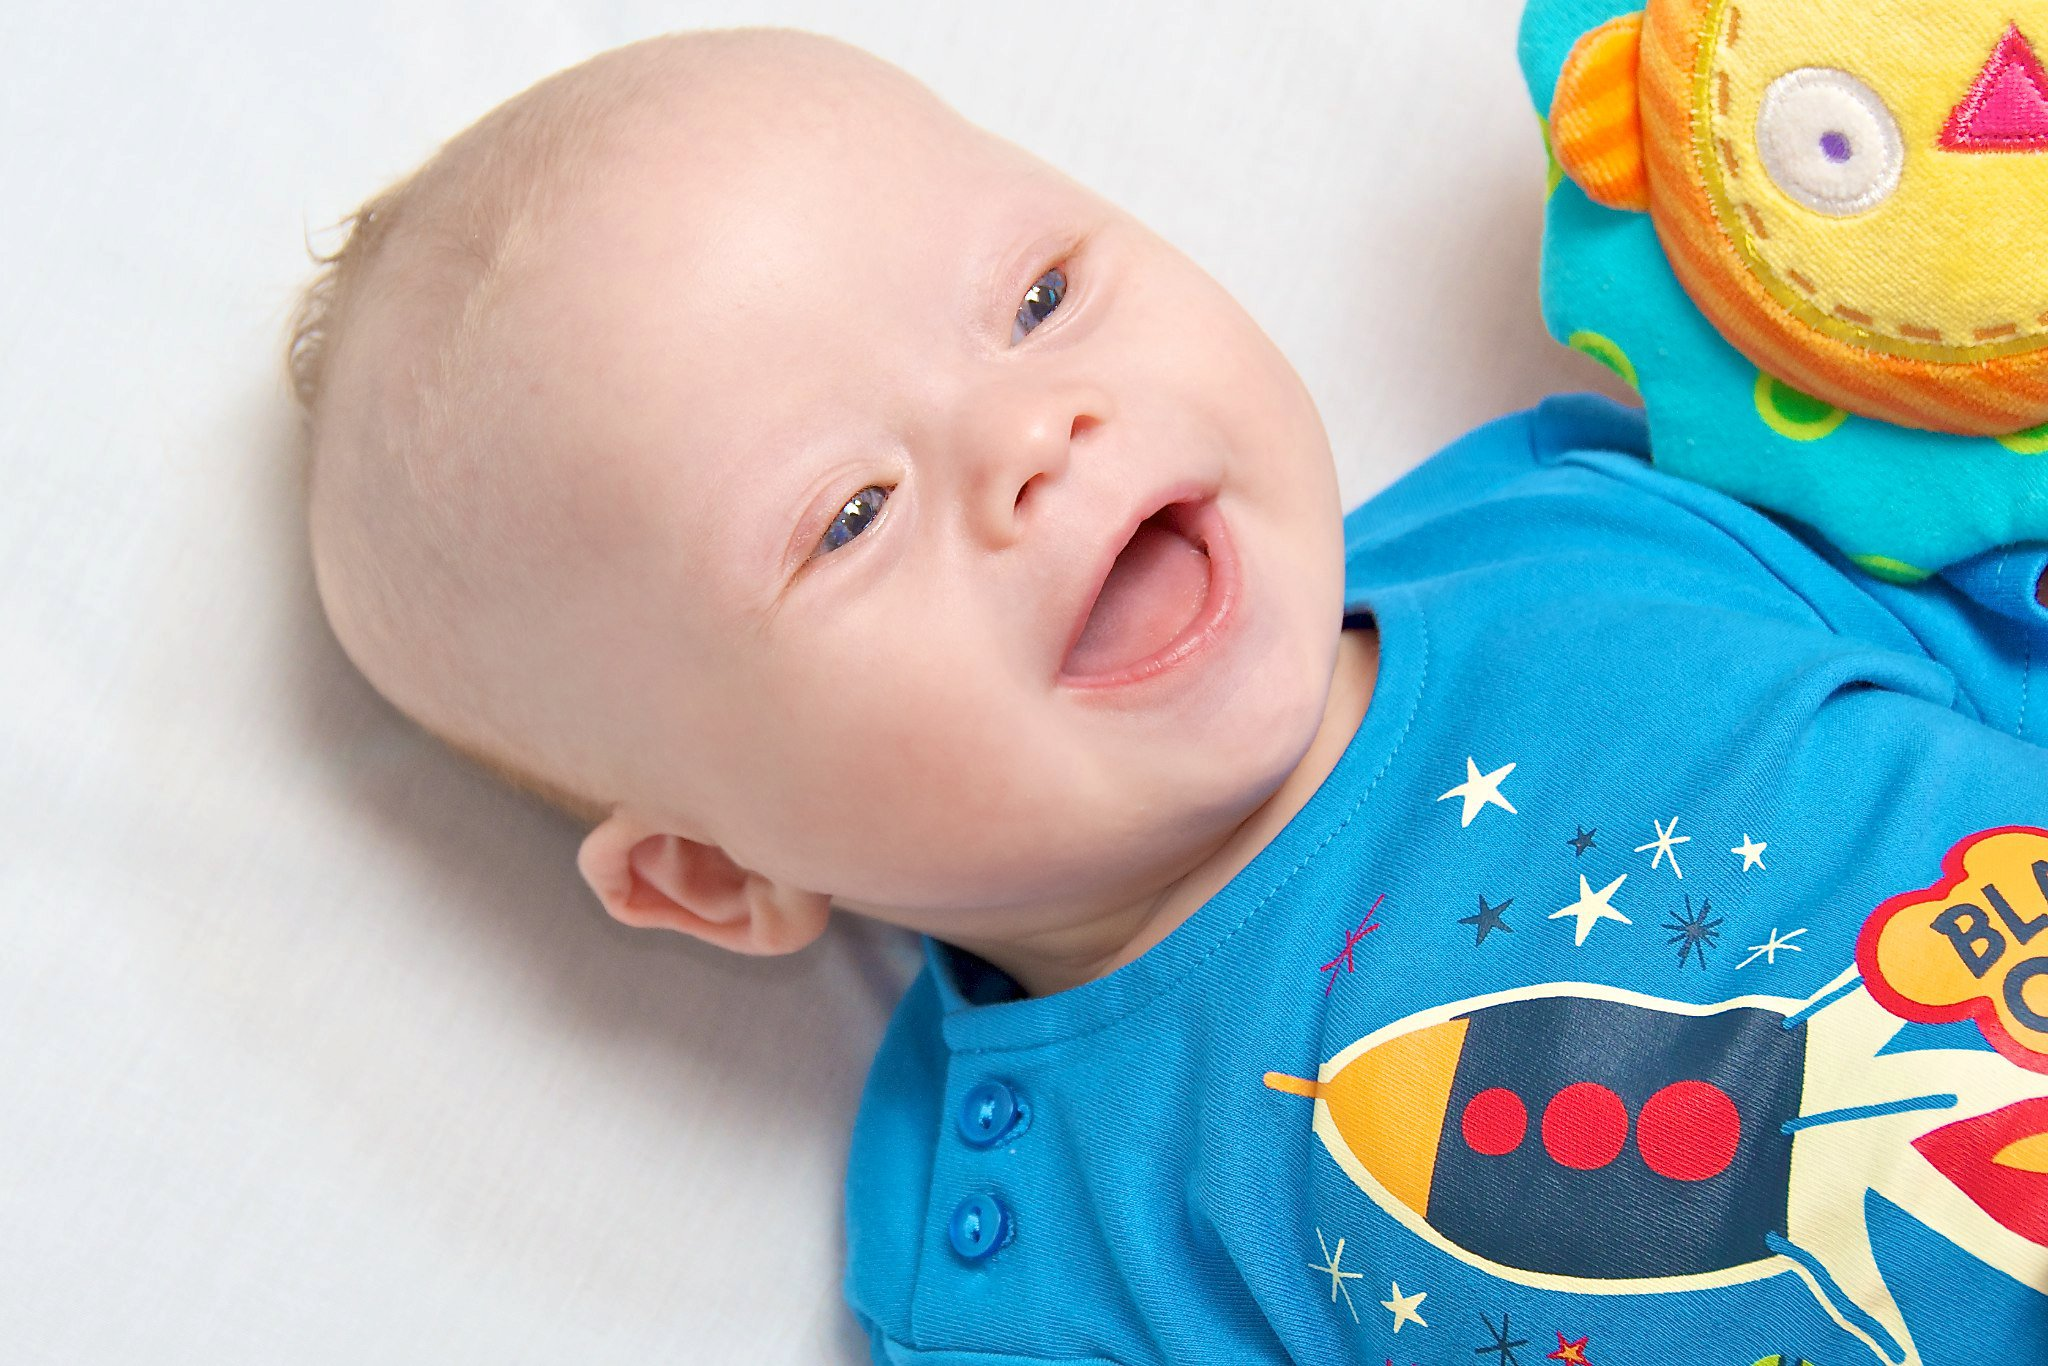 cute-down-syndrome-baby-boy-eyes-smile.jpg